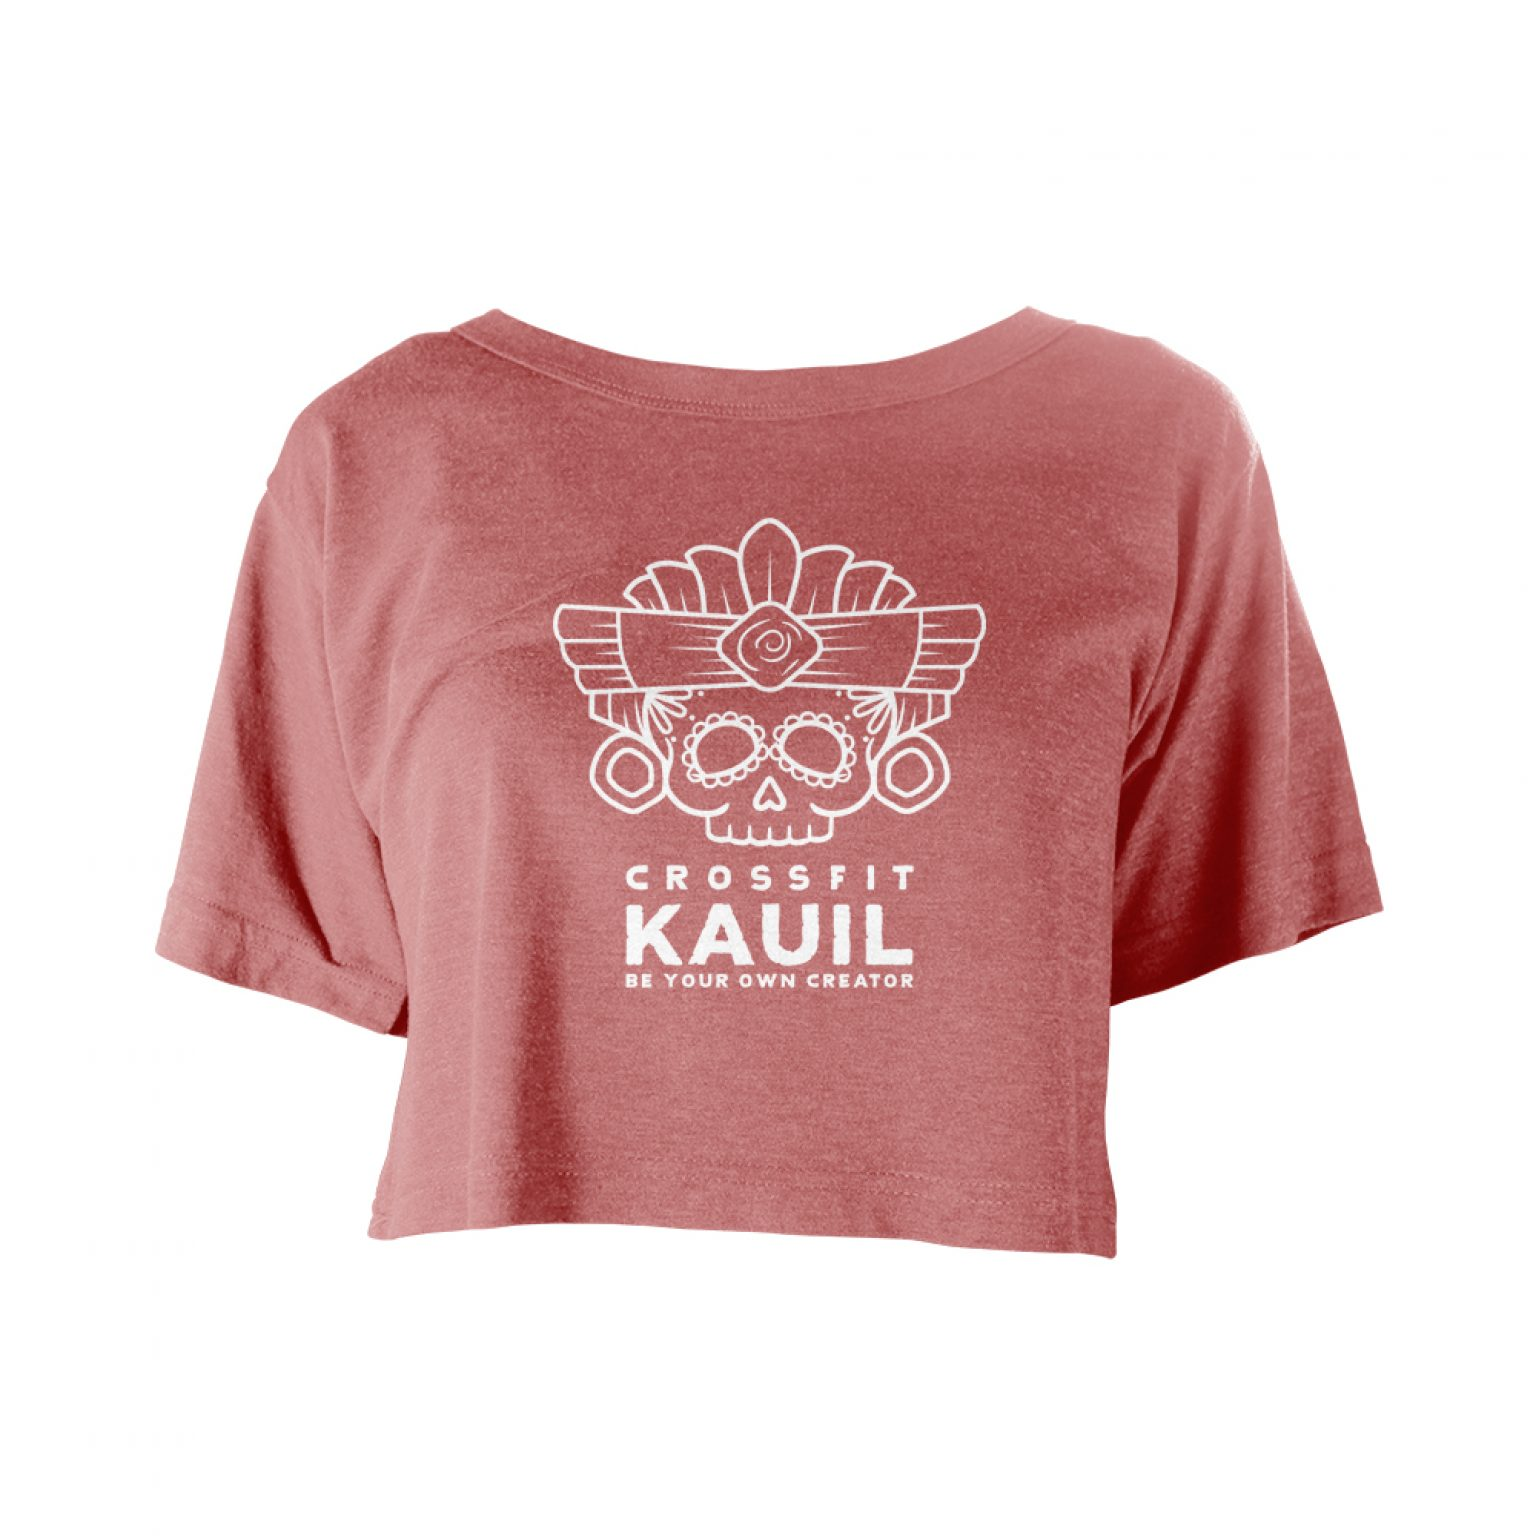 CrossFit Kauil Festival Paprika weiss